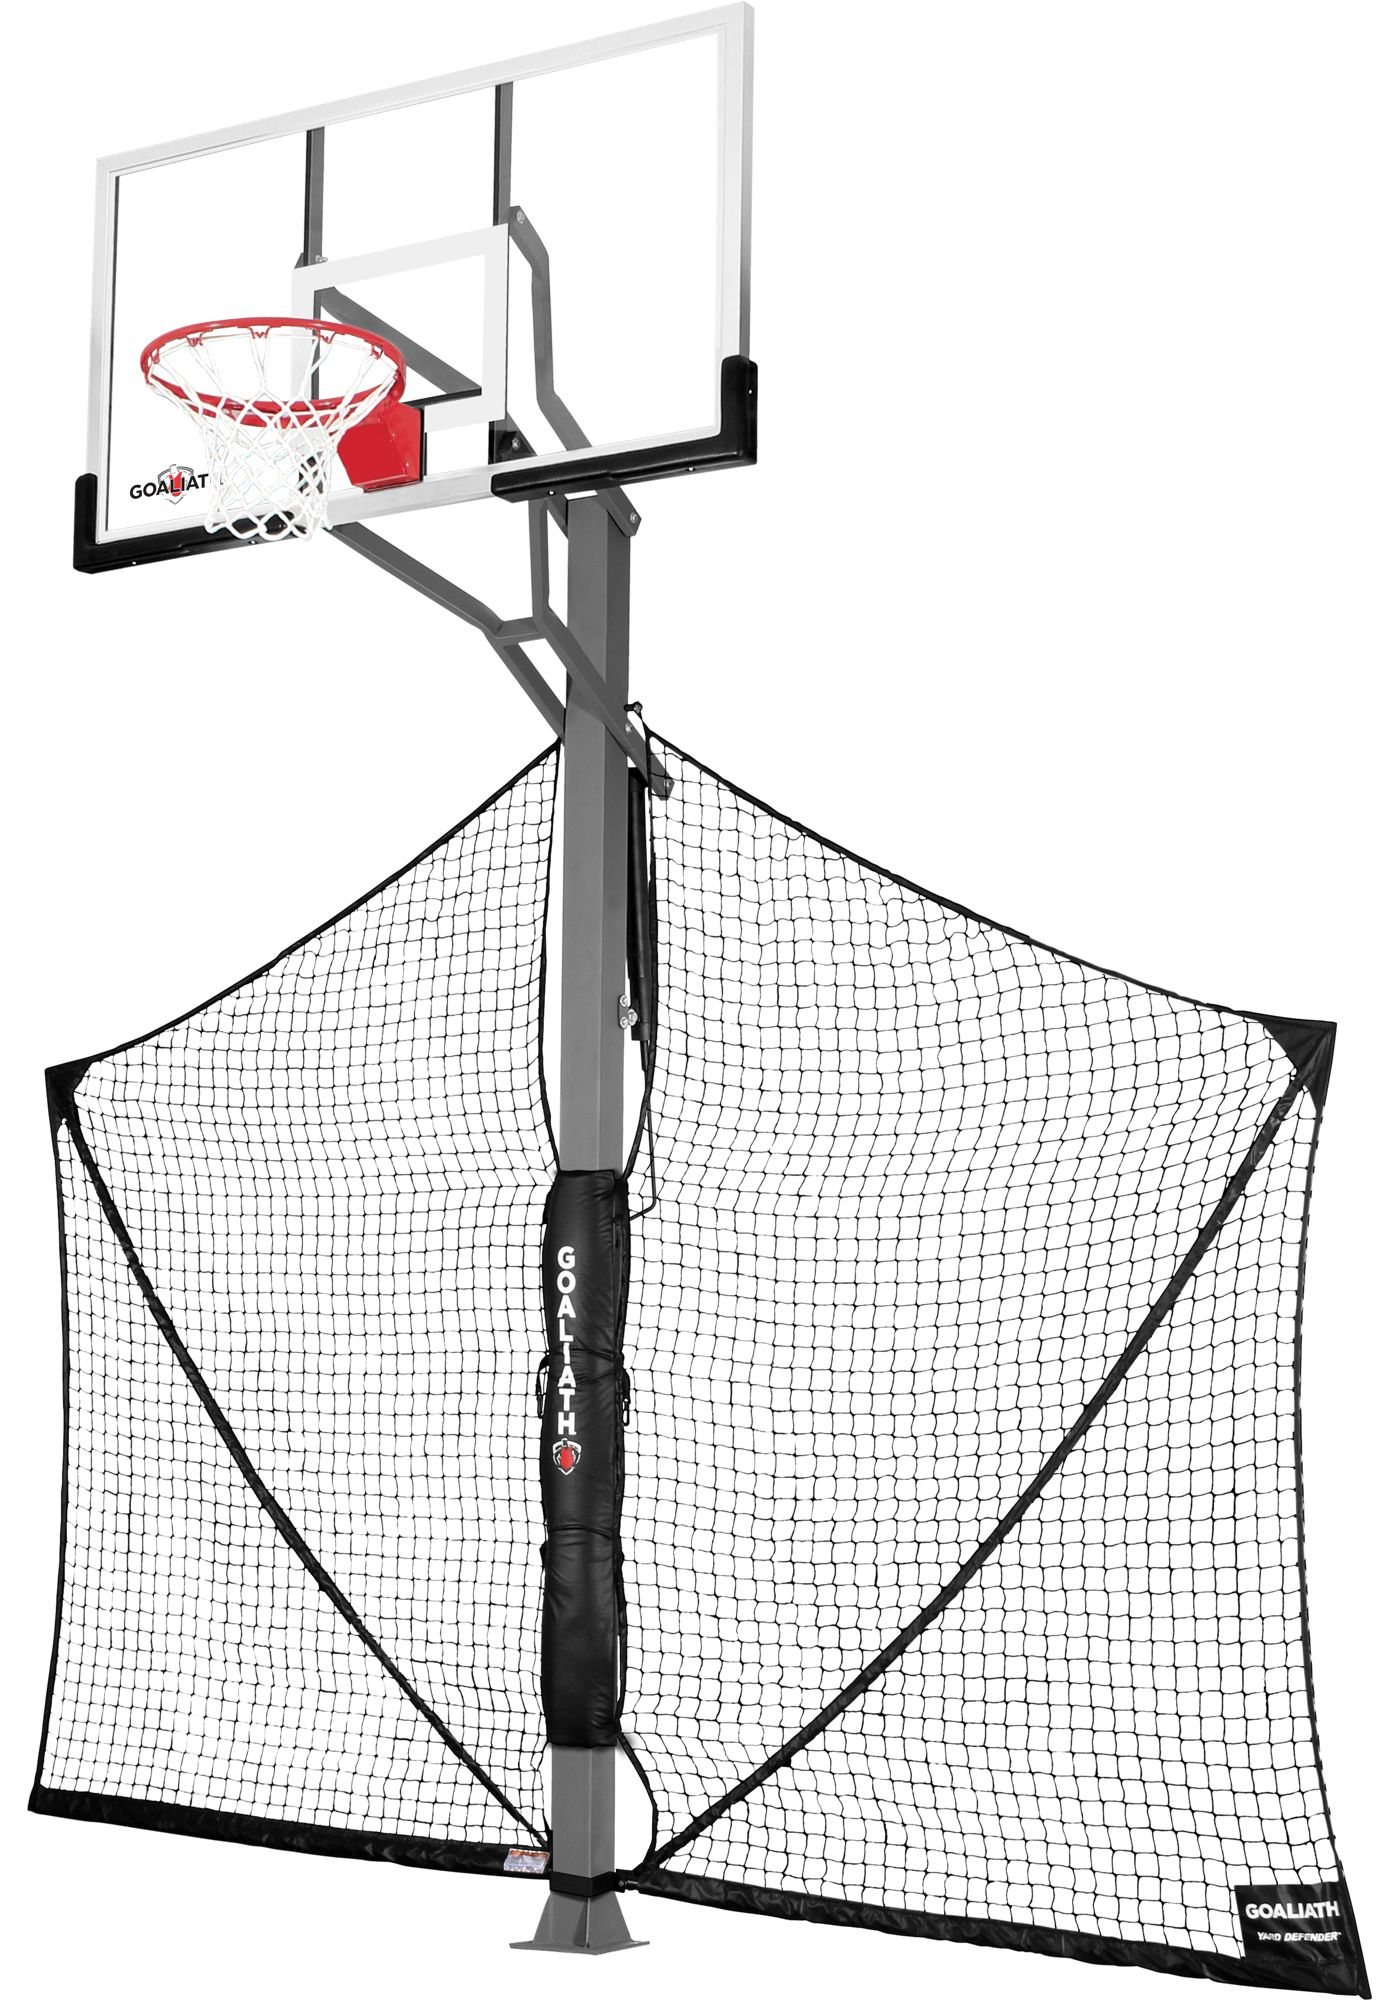 "Goaliath 60"" In-Ground Basketball Hoop with Yard Defender"